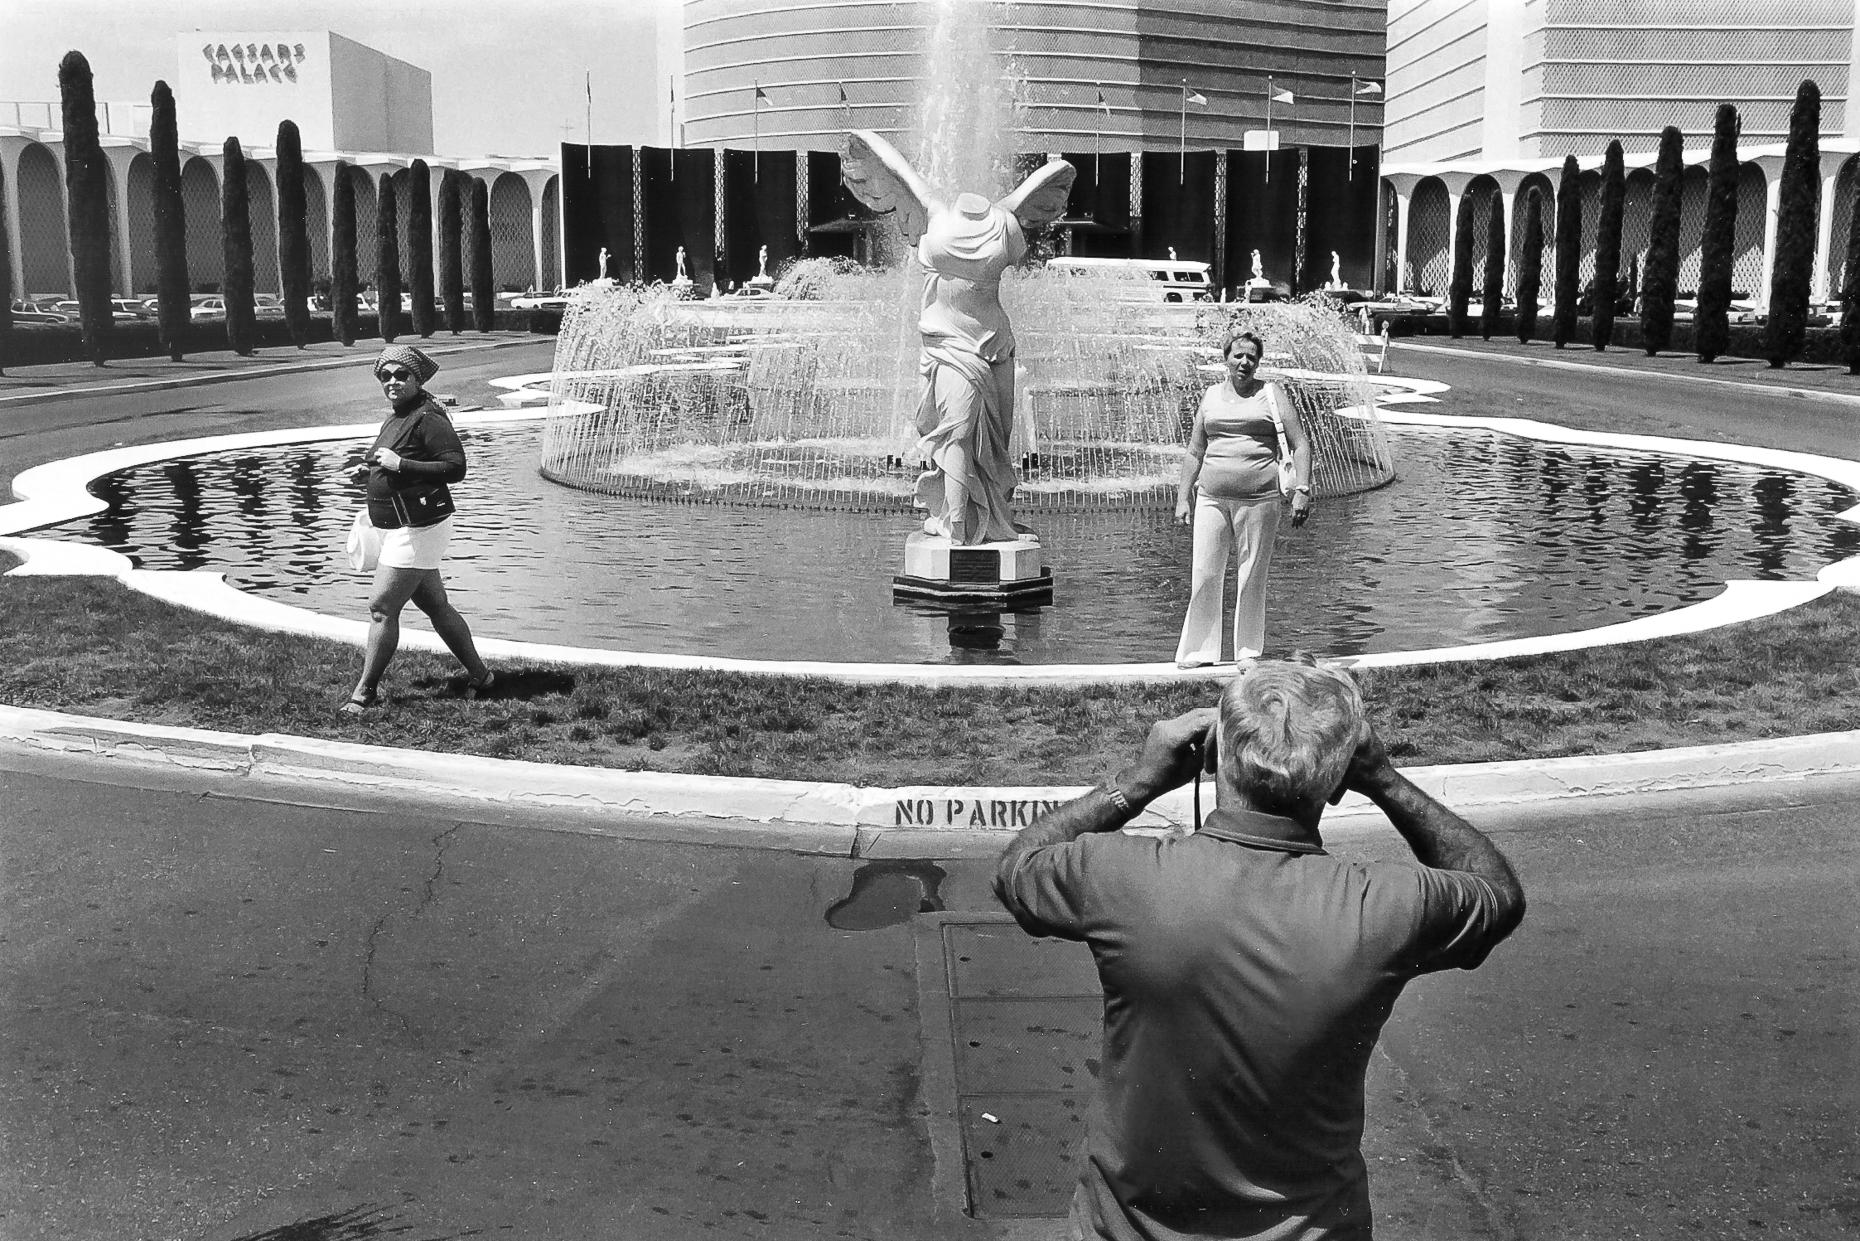 Las Vegas, Nevada, 1976